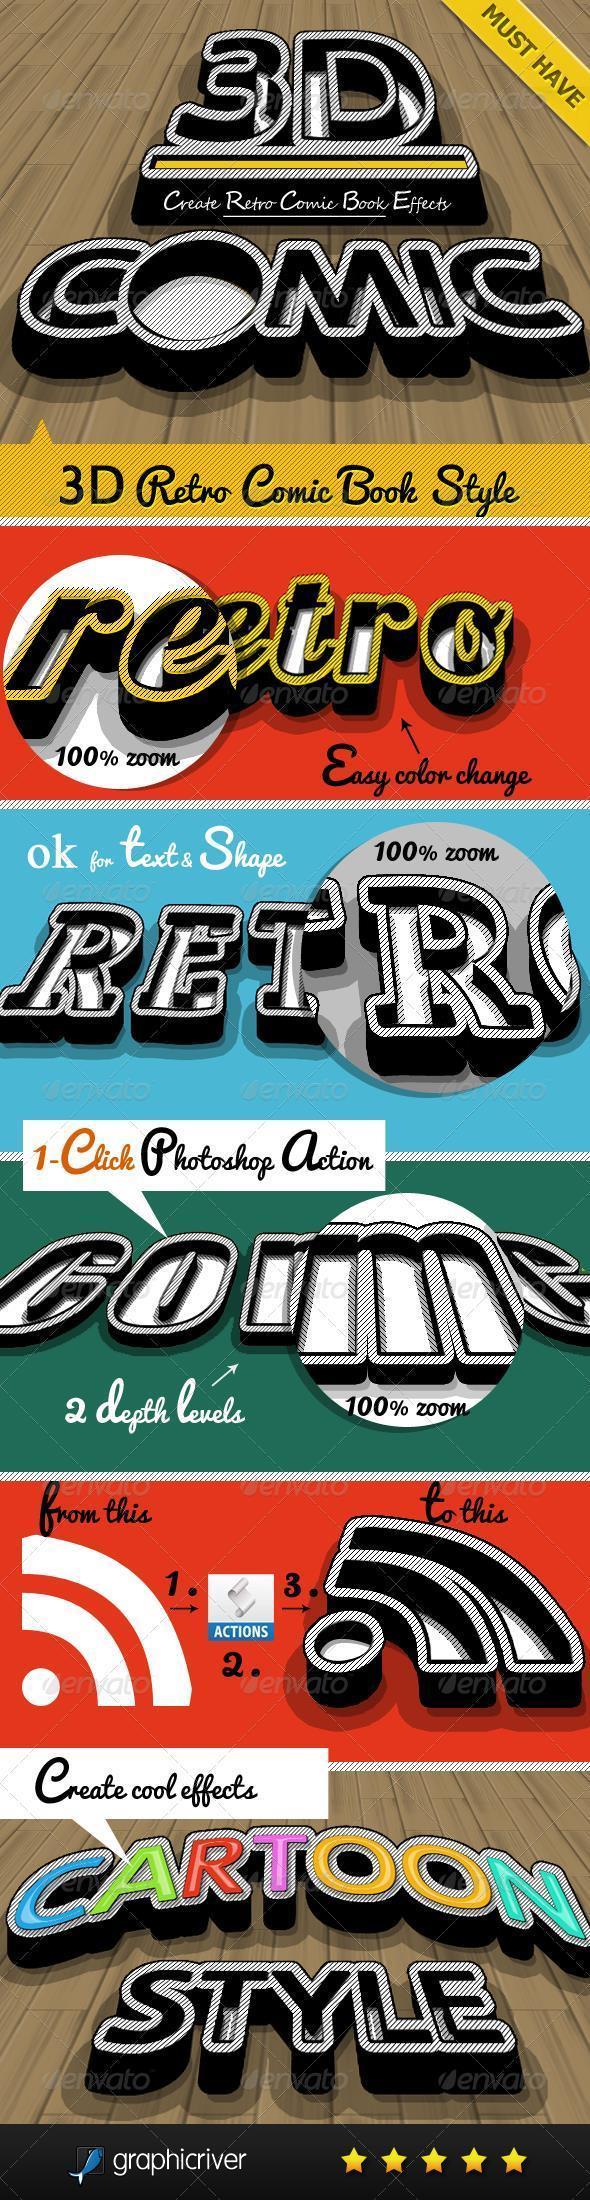 3D Retro Comics Text Style for Photoshop